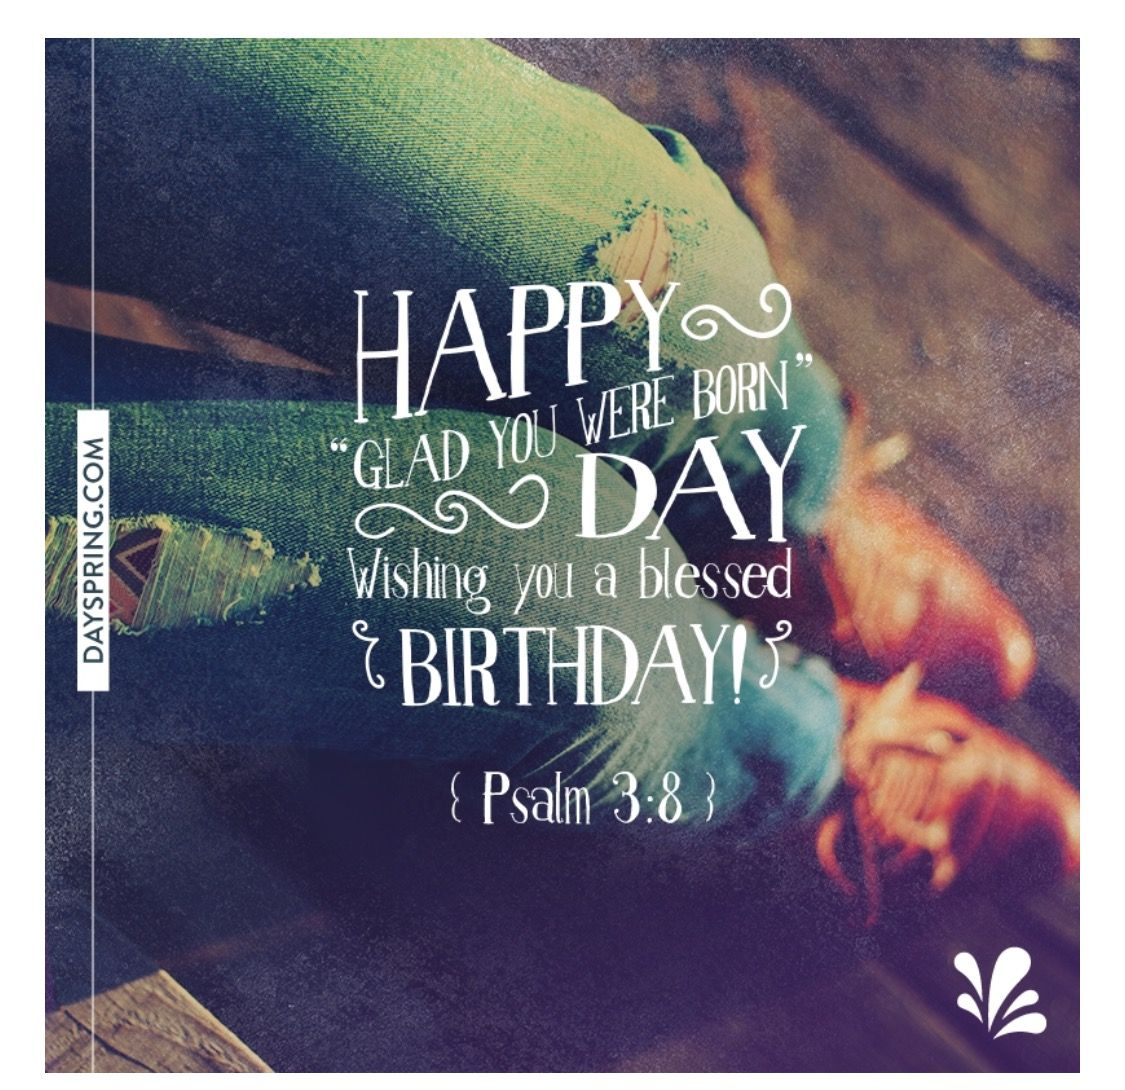 Mind Happy Glad You Were Born Pin By Damaris Maldonado On Birthday Wishes Pinterest Birthdays Happy Birthday Blessings Nephew Happy Birthday Blessings Him gifts Happy Birthday Blessings